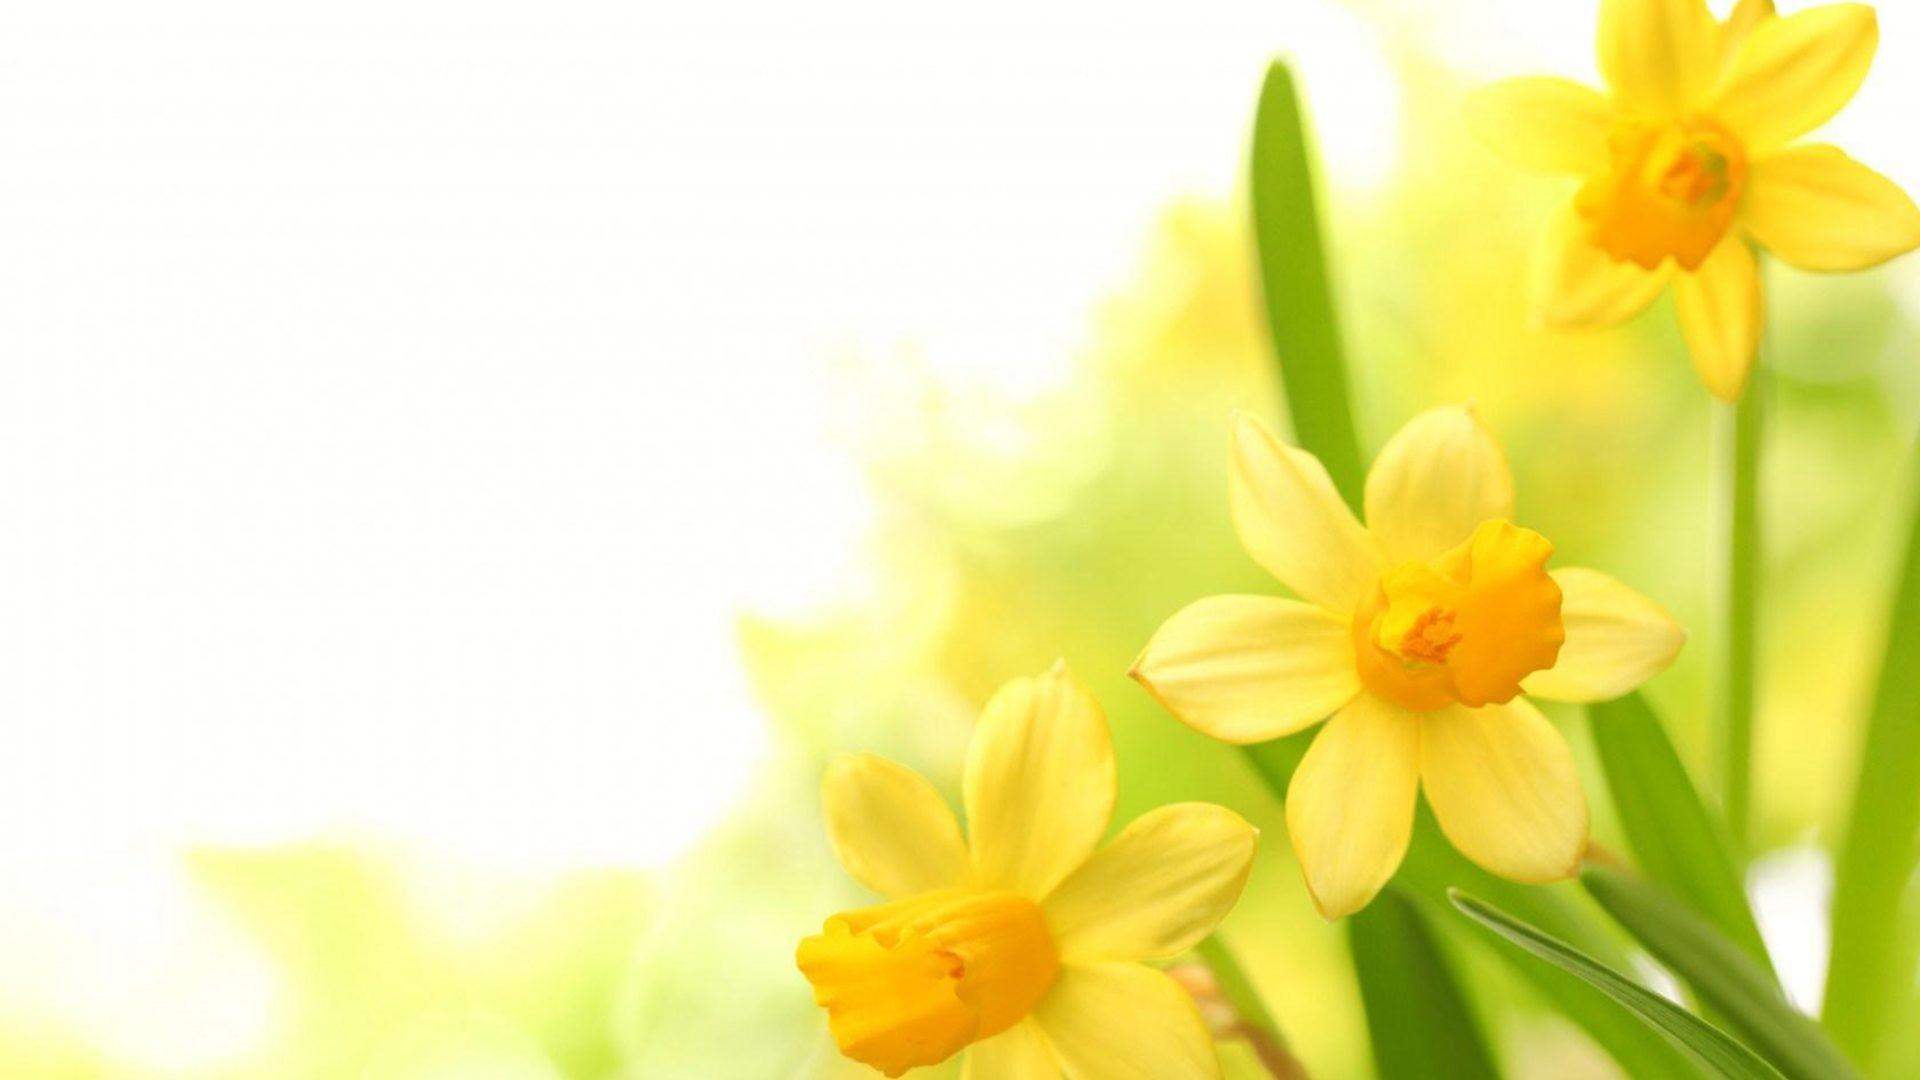 Hawaii Desktop Wallpaper Hd Plants Narcissus Yellow Flower Wallpapers13 Com